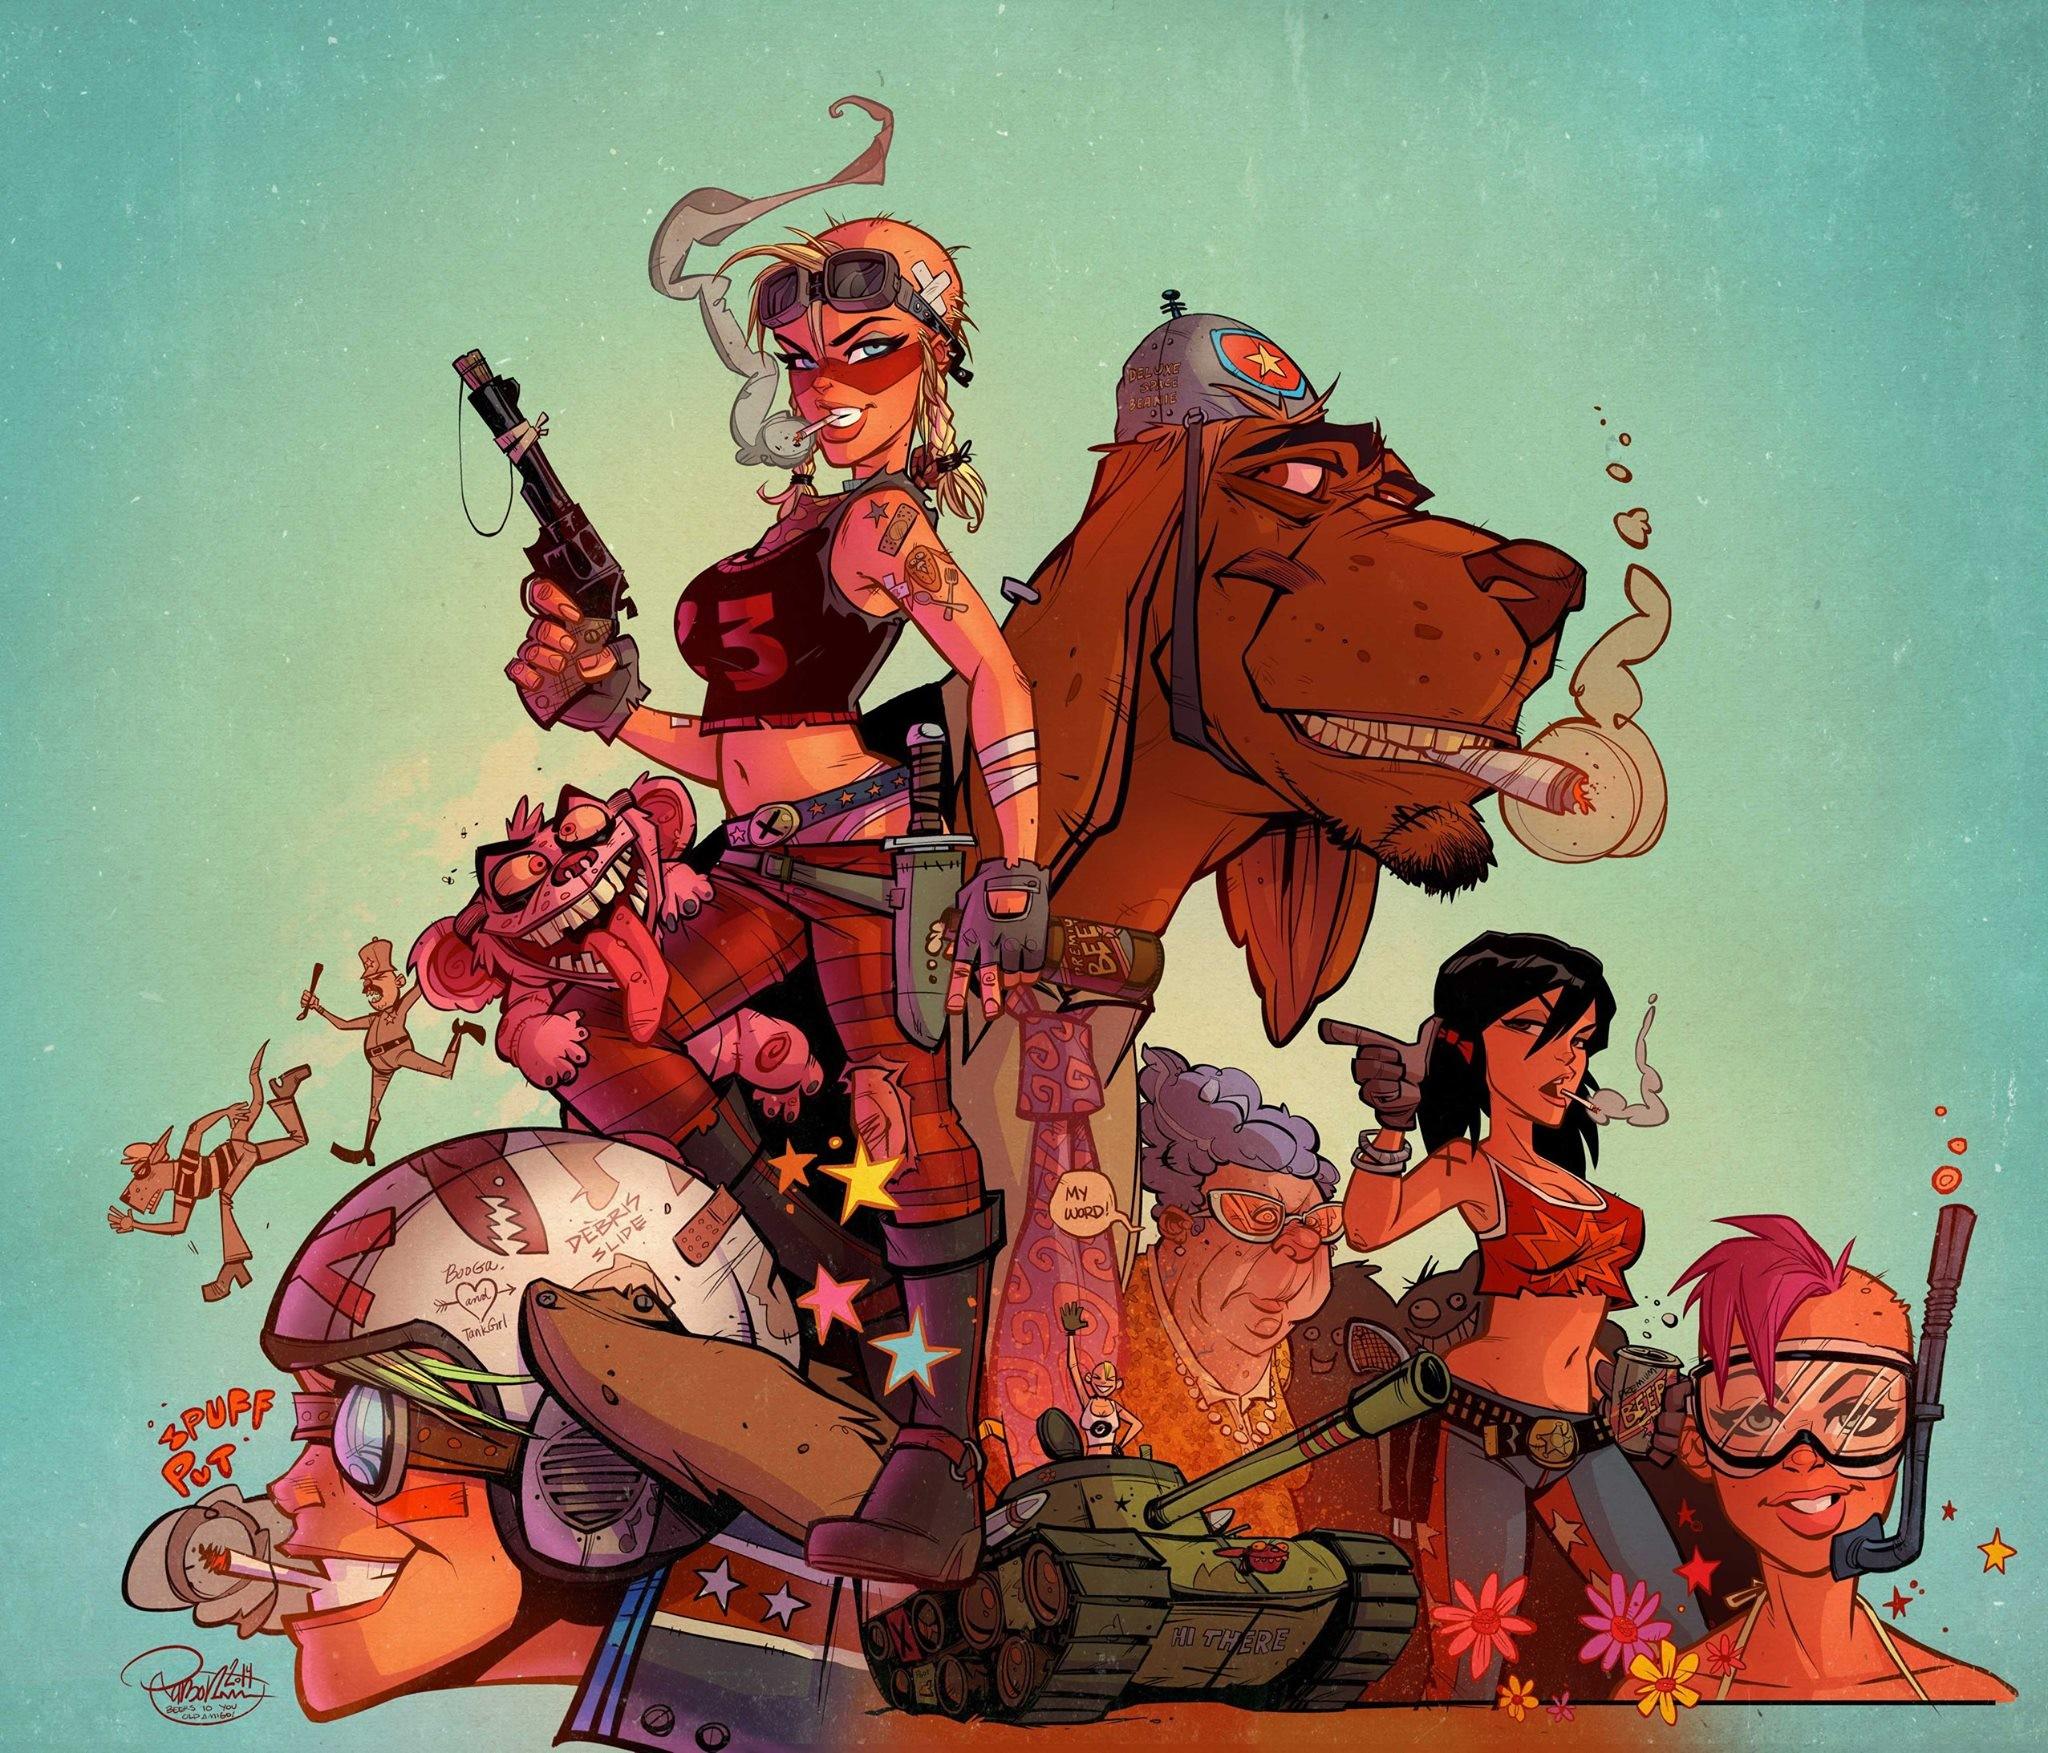 Wallpaper Illustration Cartoon Comics Mythology Tank Girl